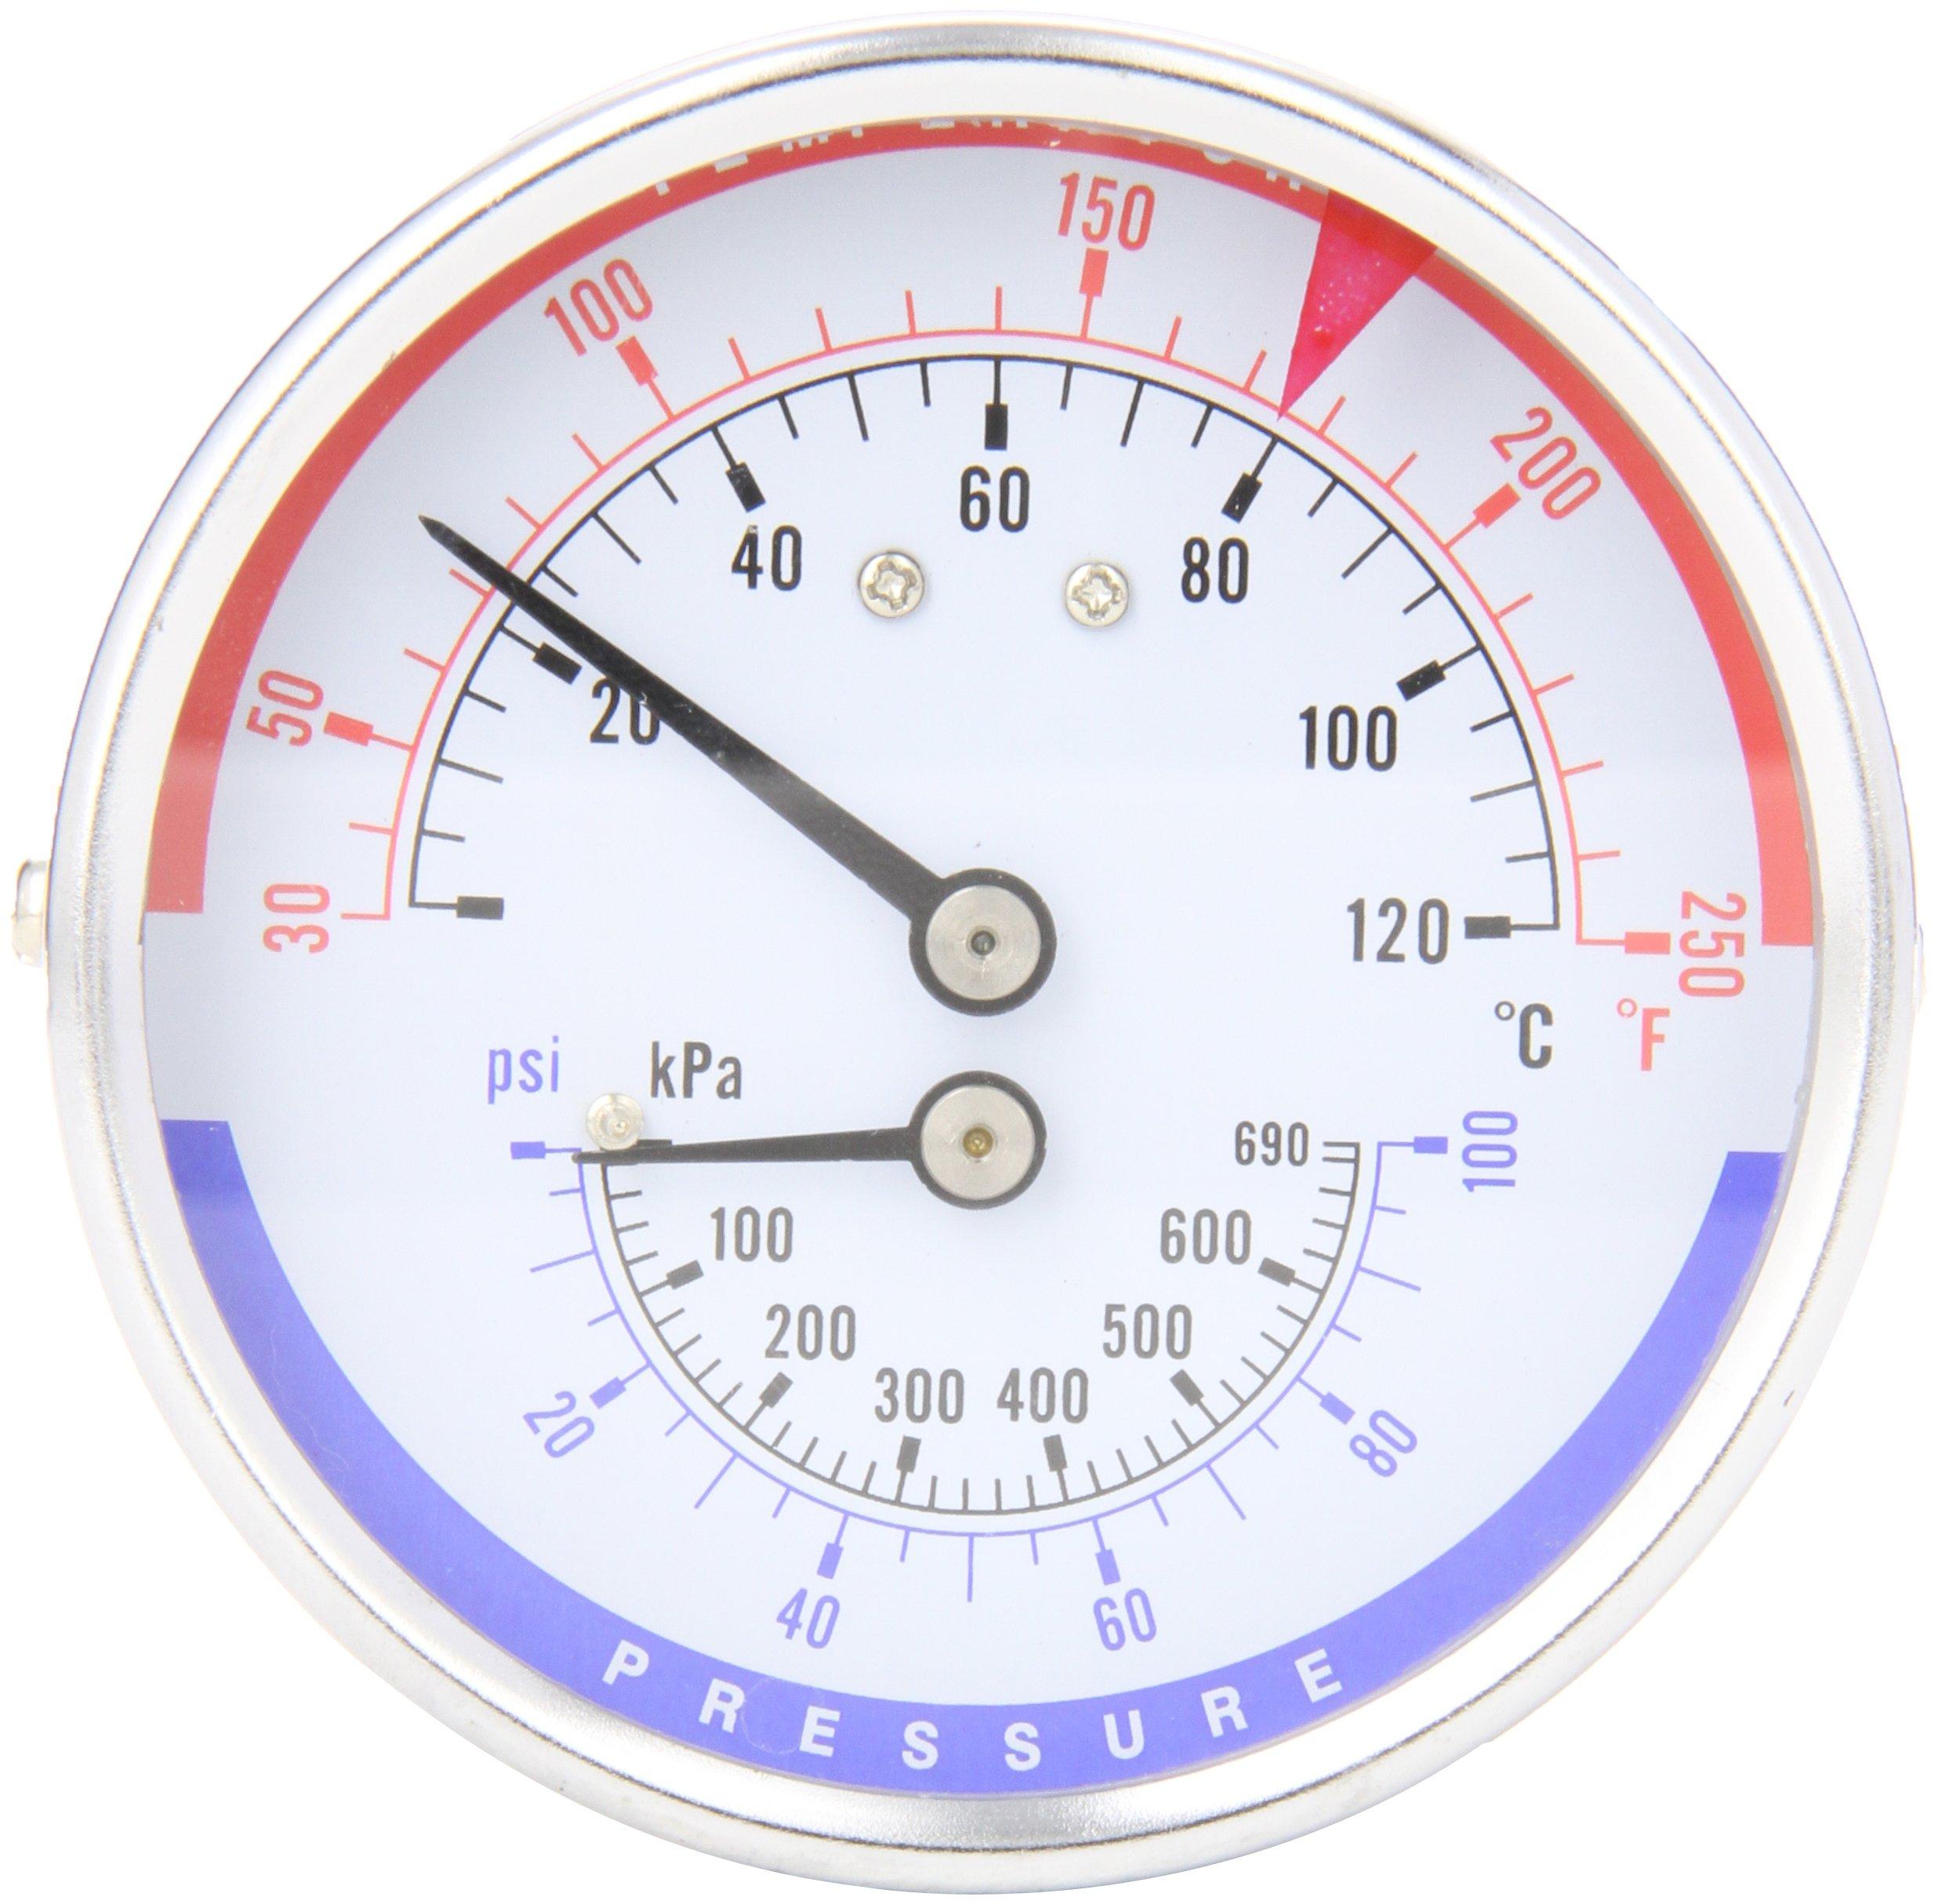 Trerice PTC14603 Rear Stem Tridicator, 1/2'' NPT Connection, 3'' face, 30-250˚F/C & 0-100 PSI/KPA